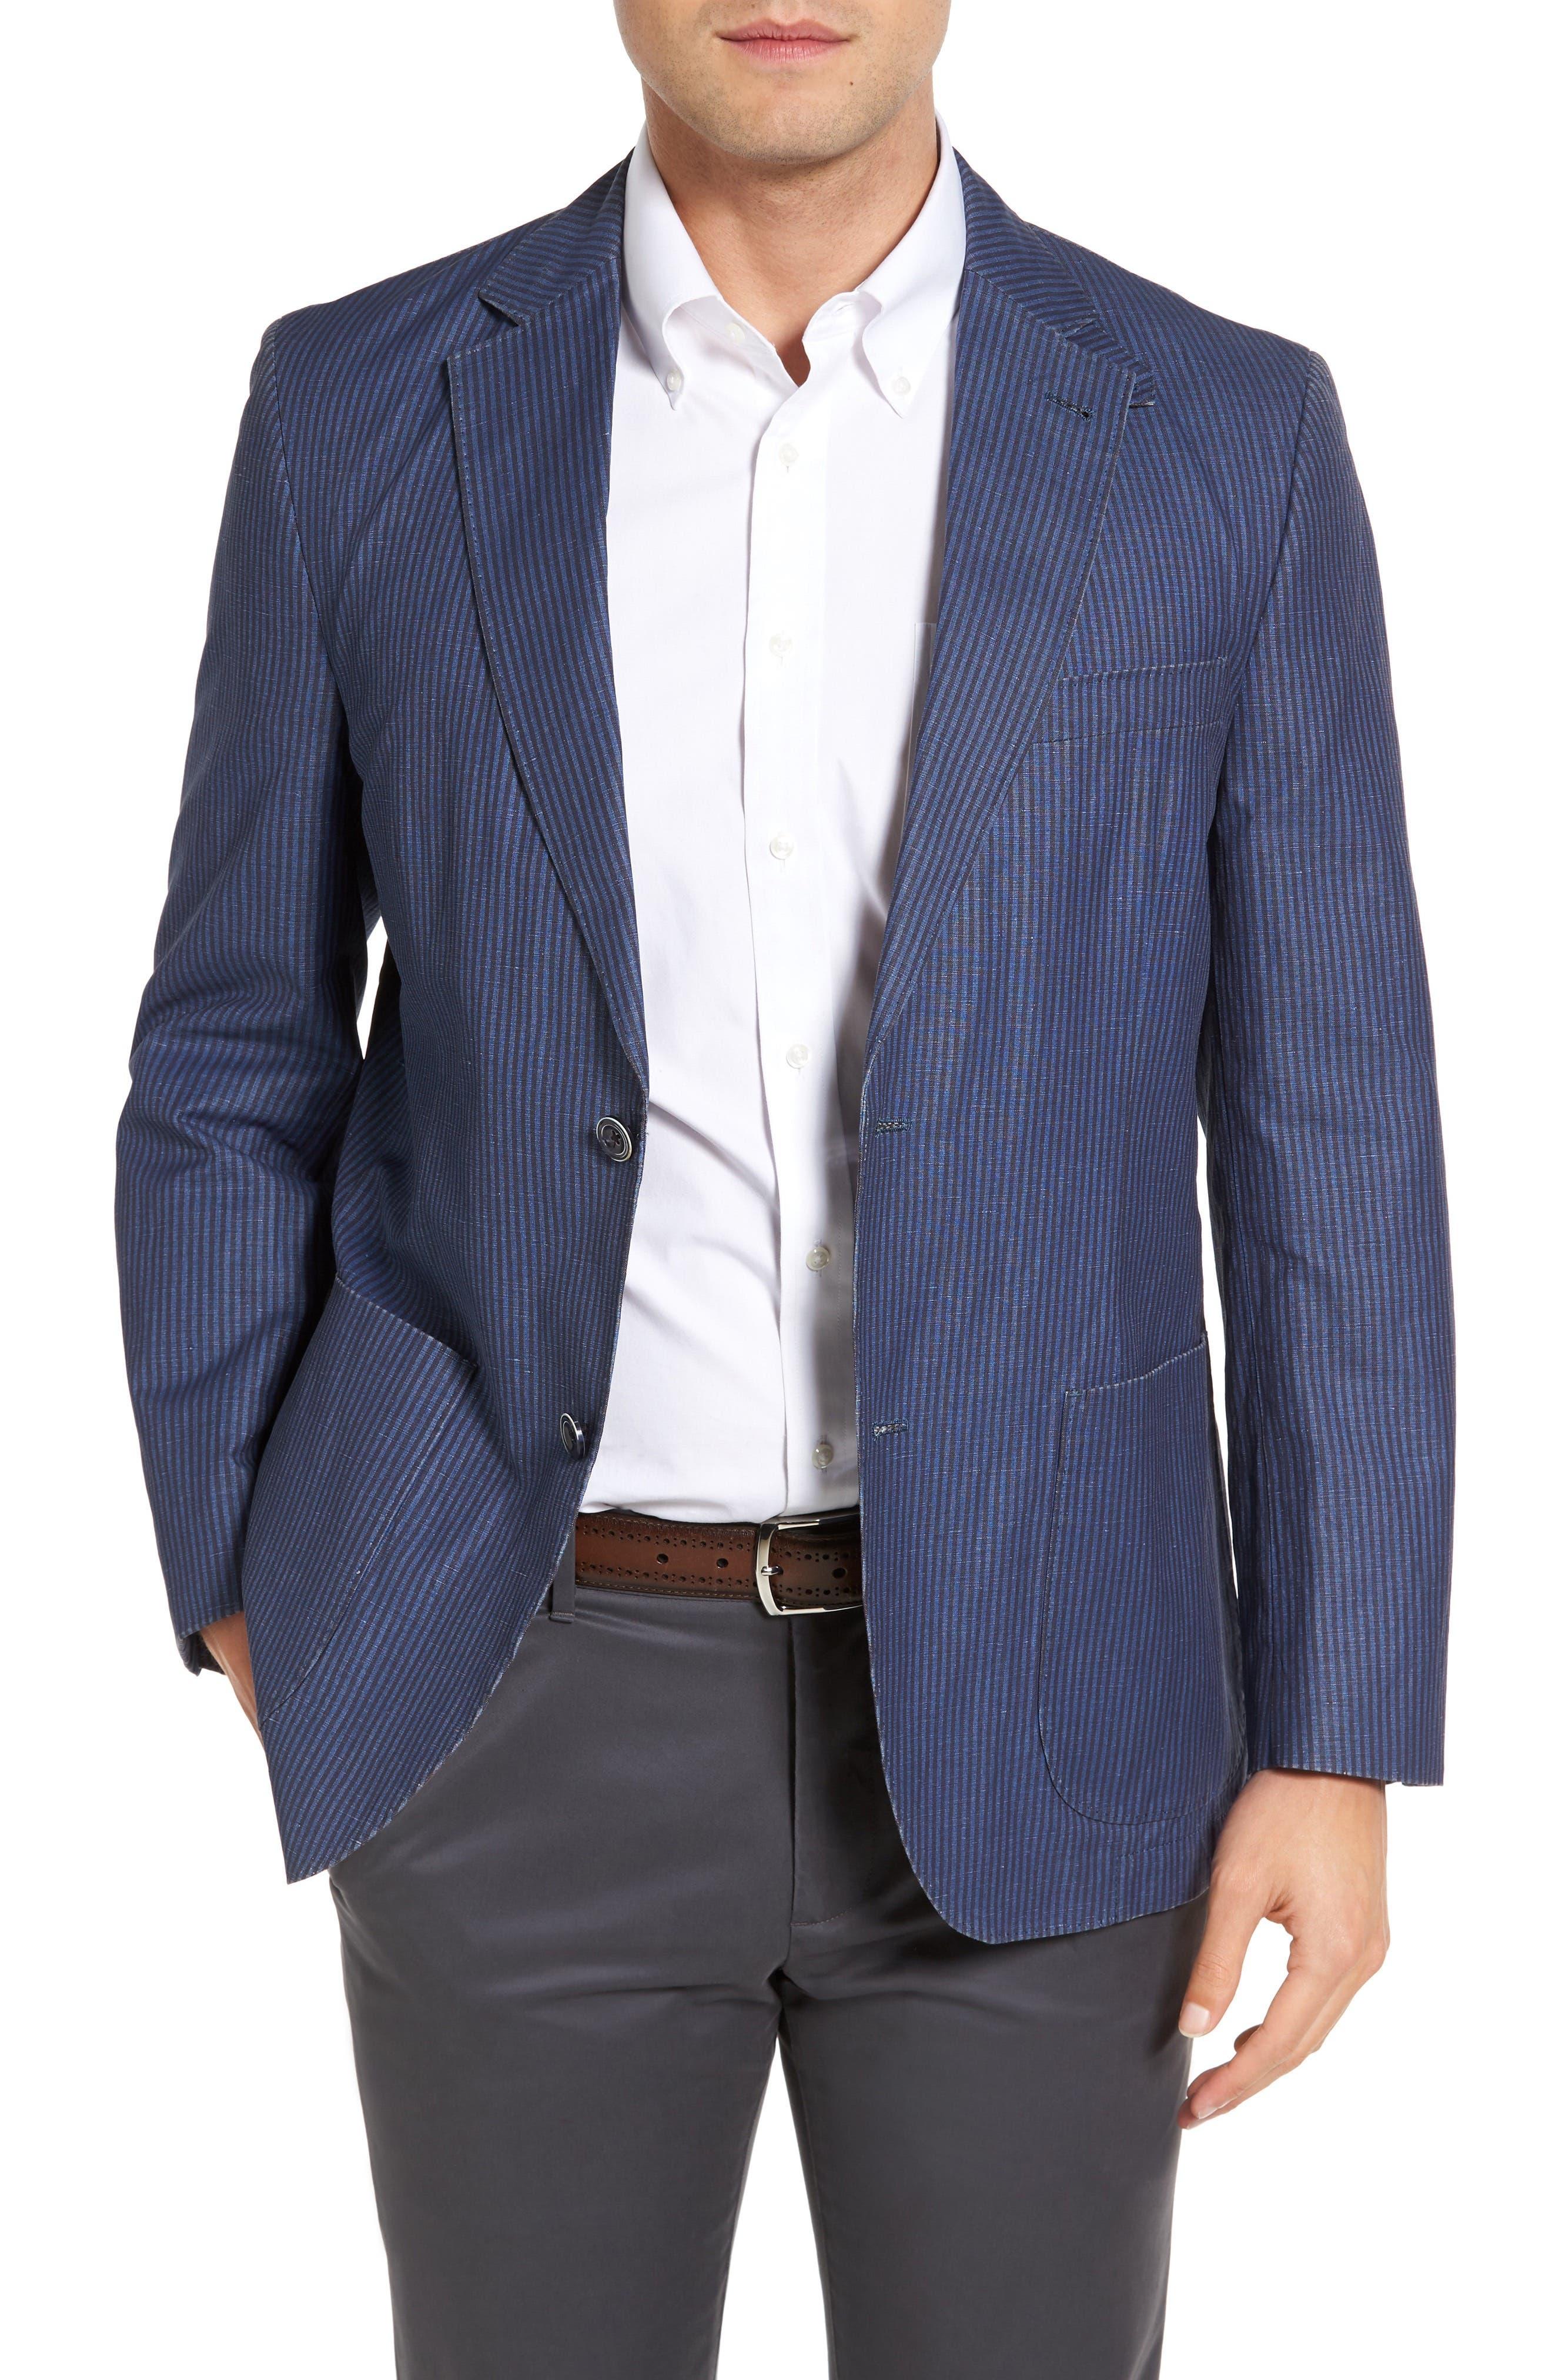 Alternate Image 1 Selected - Kroon Bono 2 Classic Fit Stripe Cotton & Linen Sport Coat